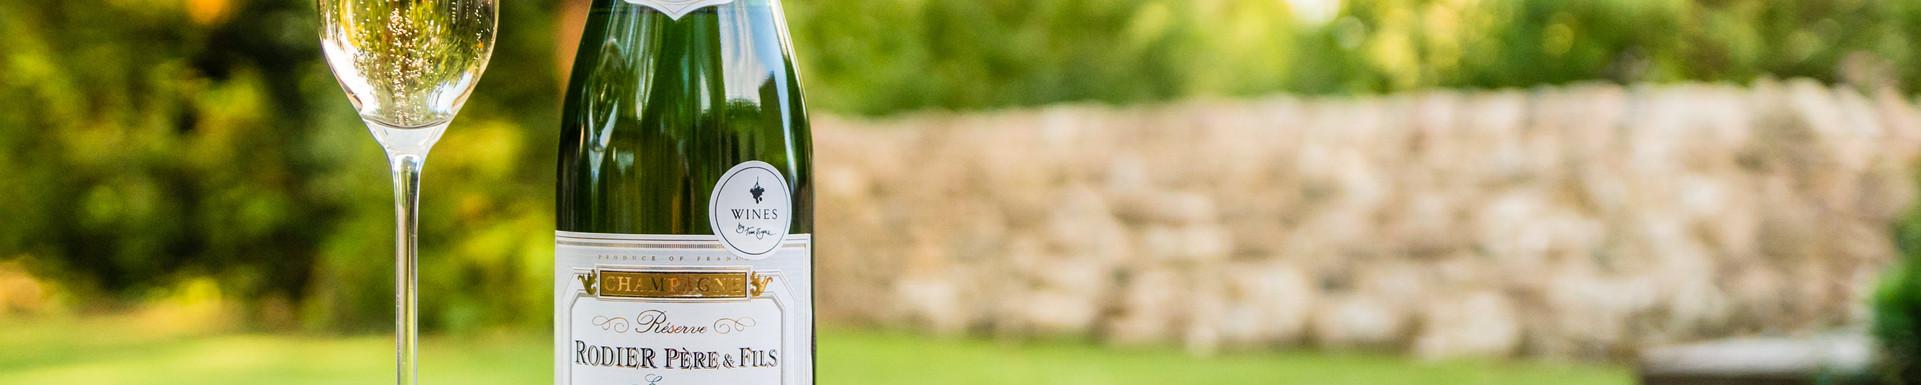 Wines by Tim Byrne July 2018-73.jpg